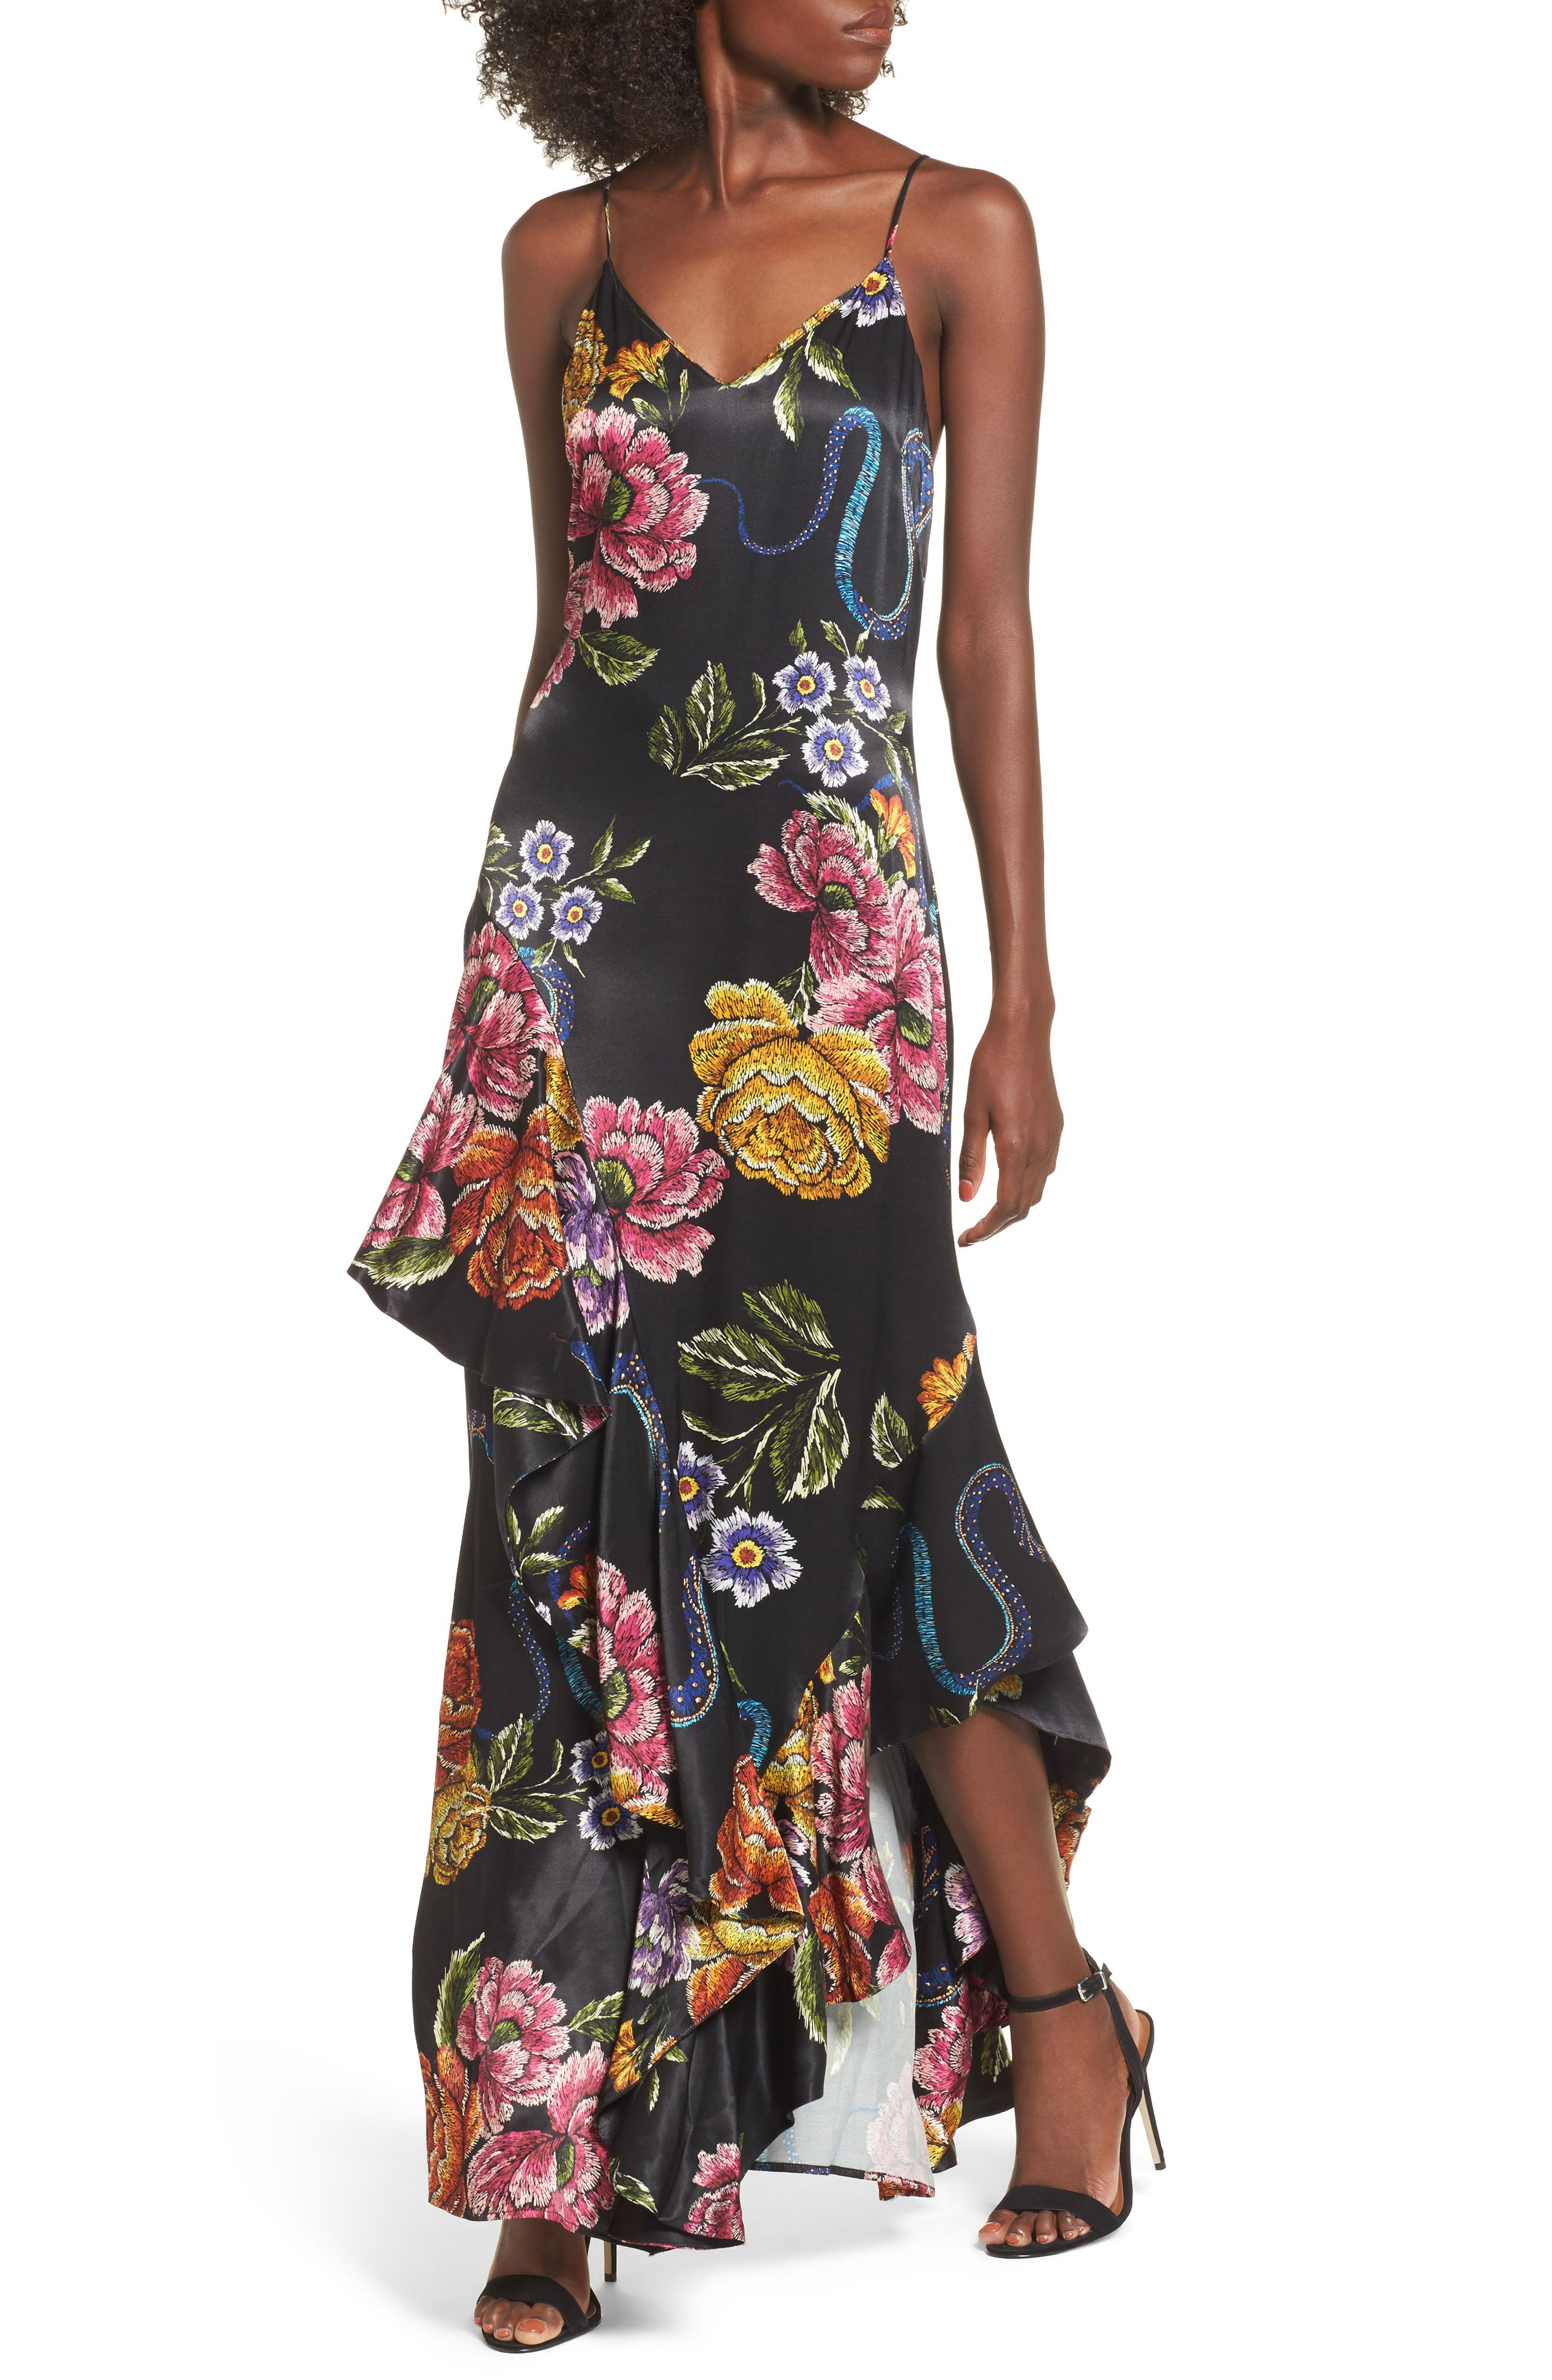 Alternate Image 1 Selected - AFRM Florence Ruffle Maxi Dress